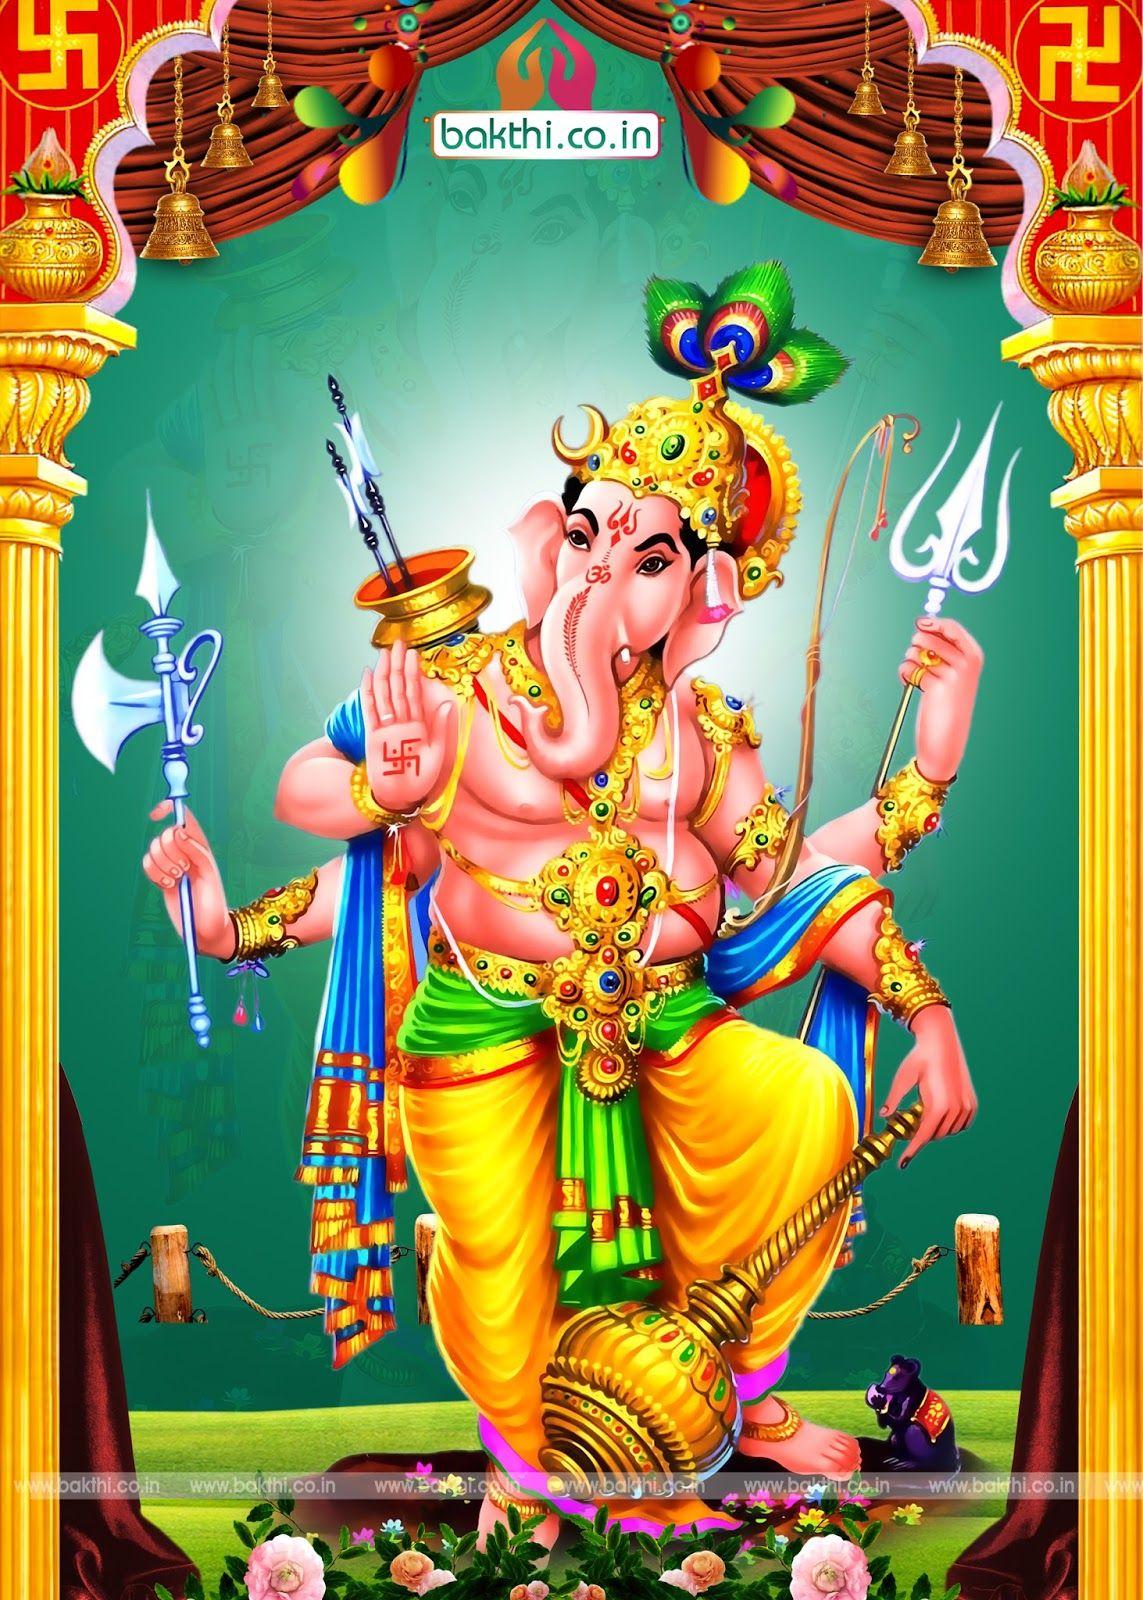 lord ganesha hd full standing photo wallpaper free bakthi co in